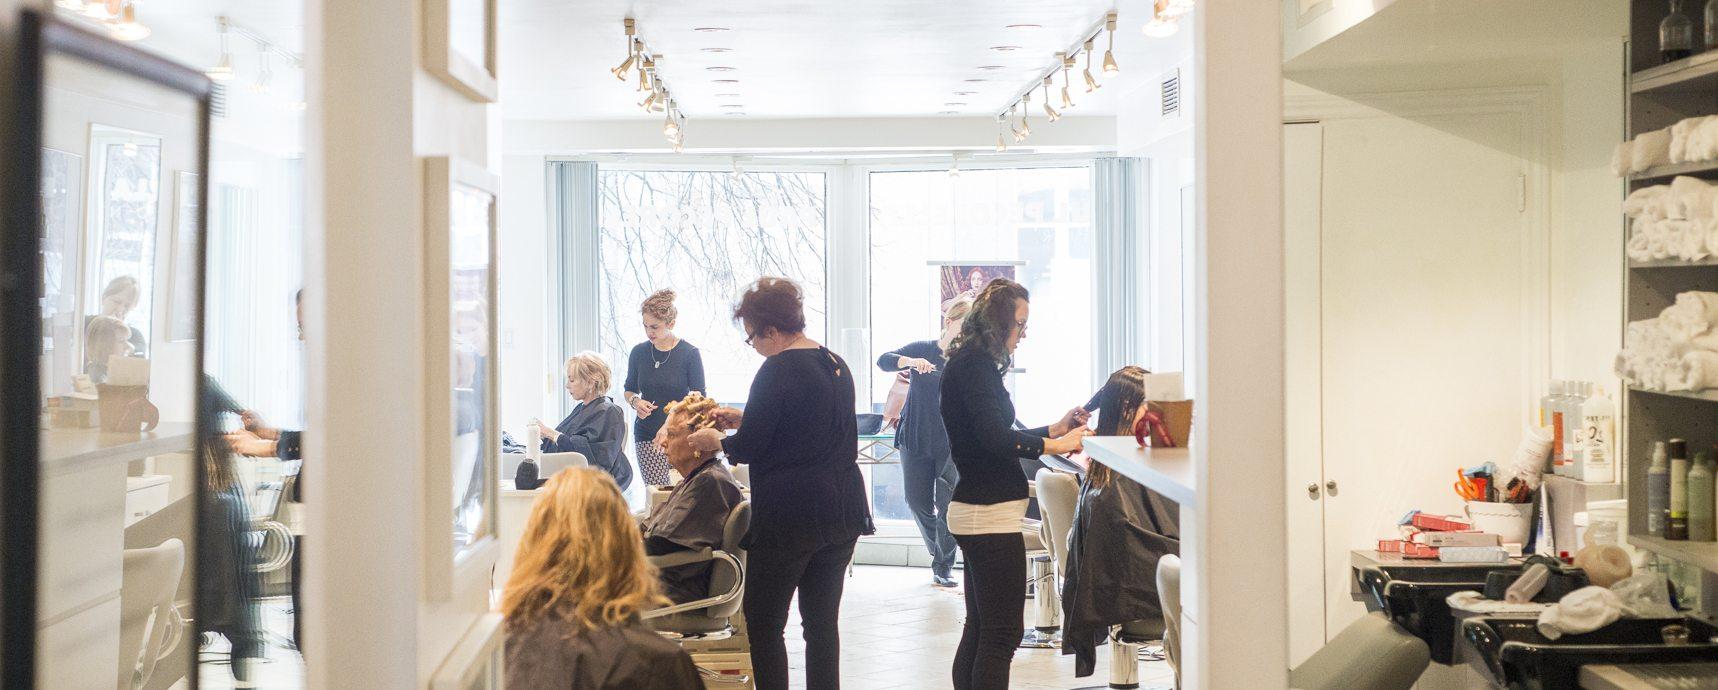 Paul Pecorella Hair Salon & Spa Celebrates Their 35-Year Anniversary in Bloor-Yorkville